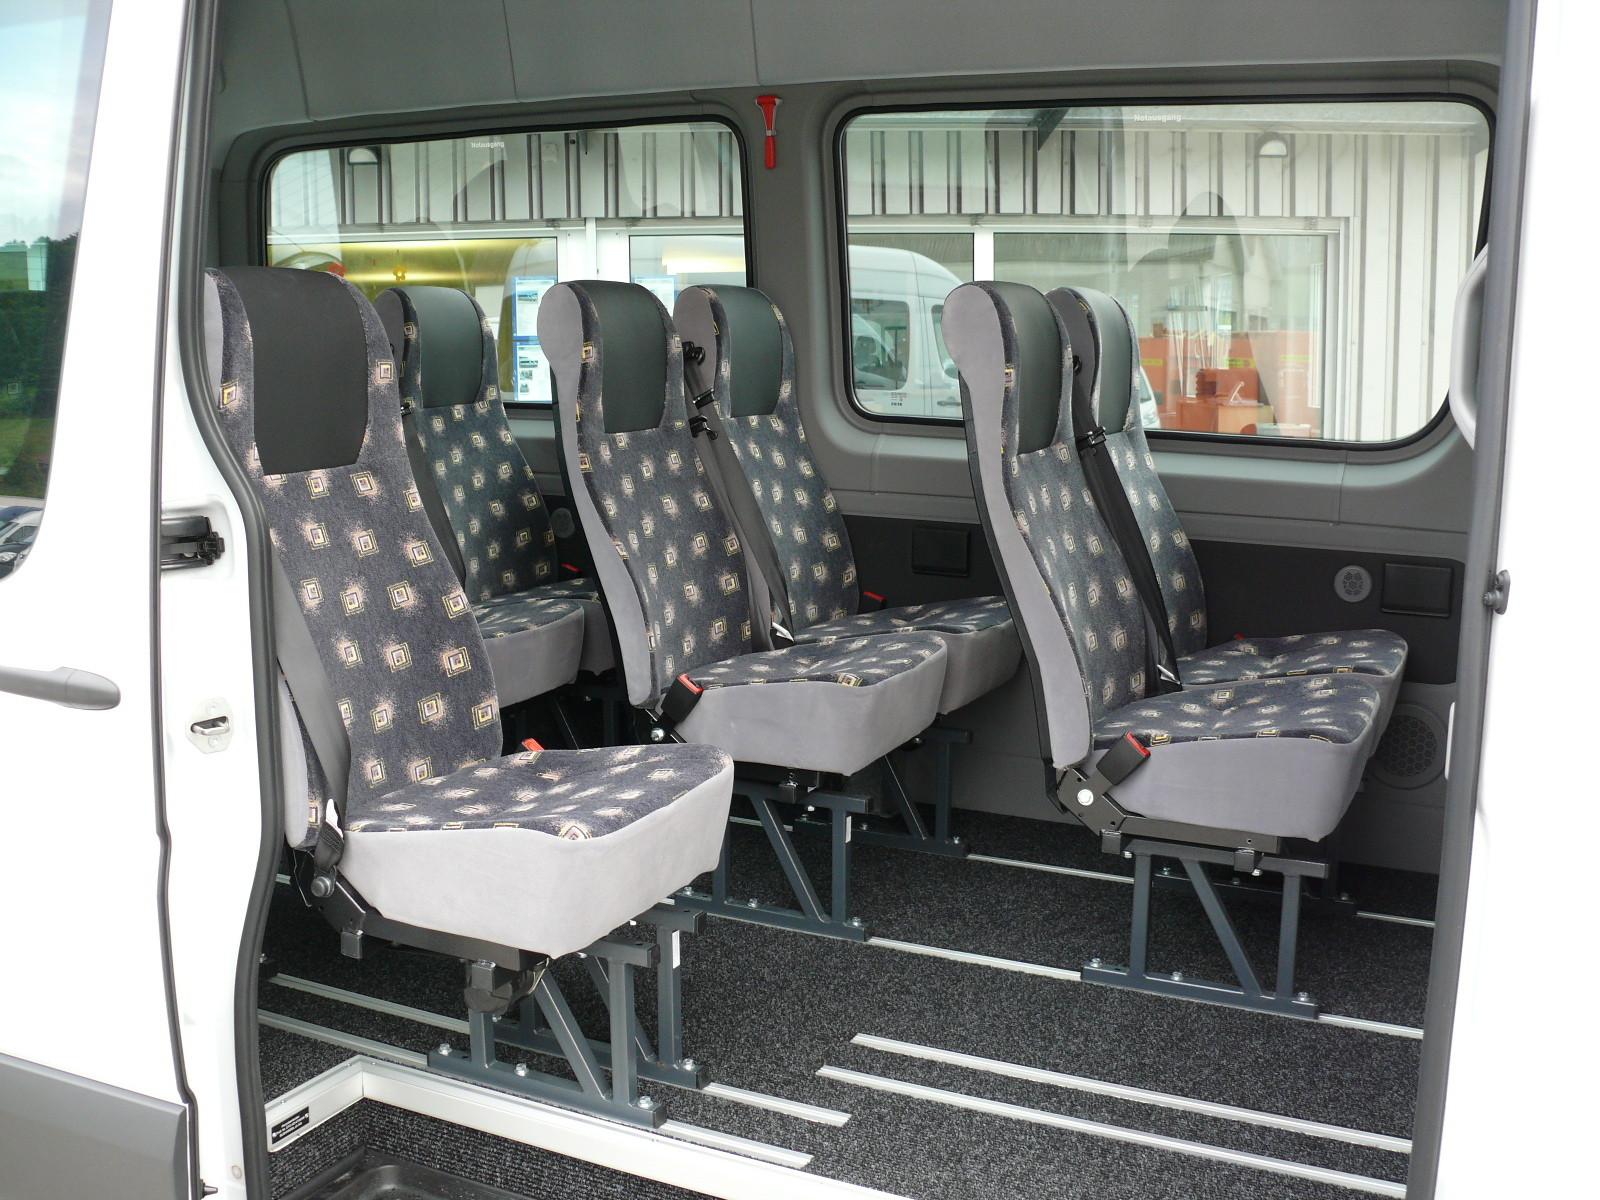 kleinbus 3 39 500 kg bus mieten bus kaufen bei ag kleinbusse midibusse vip. Black Bedroom Furniture Sets. Home Design Ideas